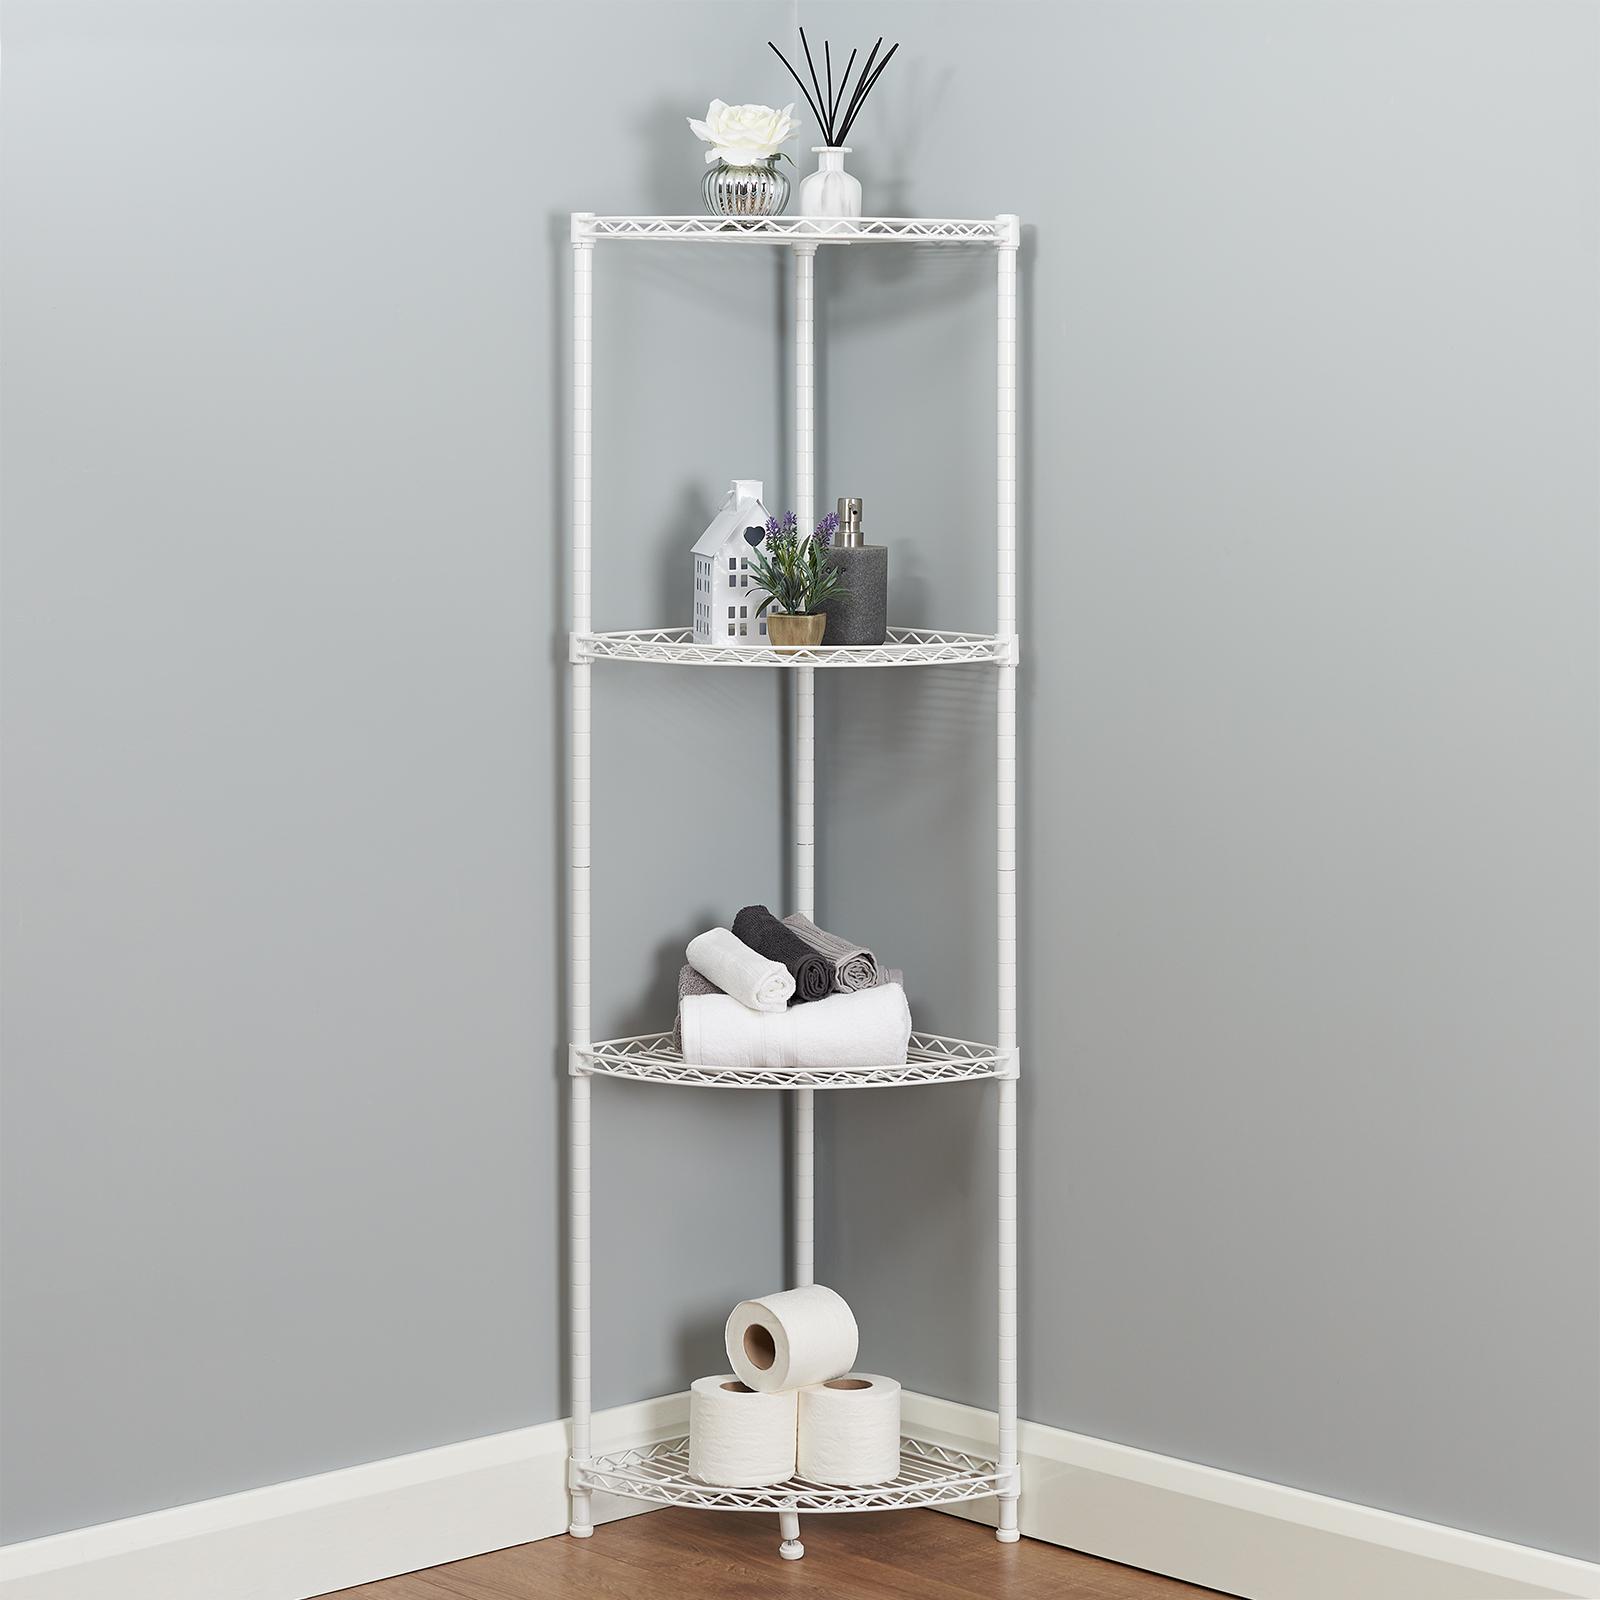 Details About 4 Tier Corner Bathroom Storage Shelves Metal White Shelving Unit Display Rack